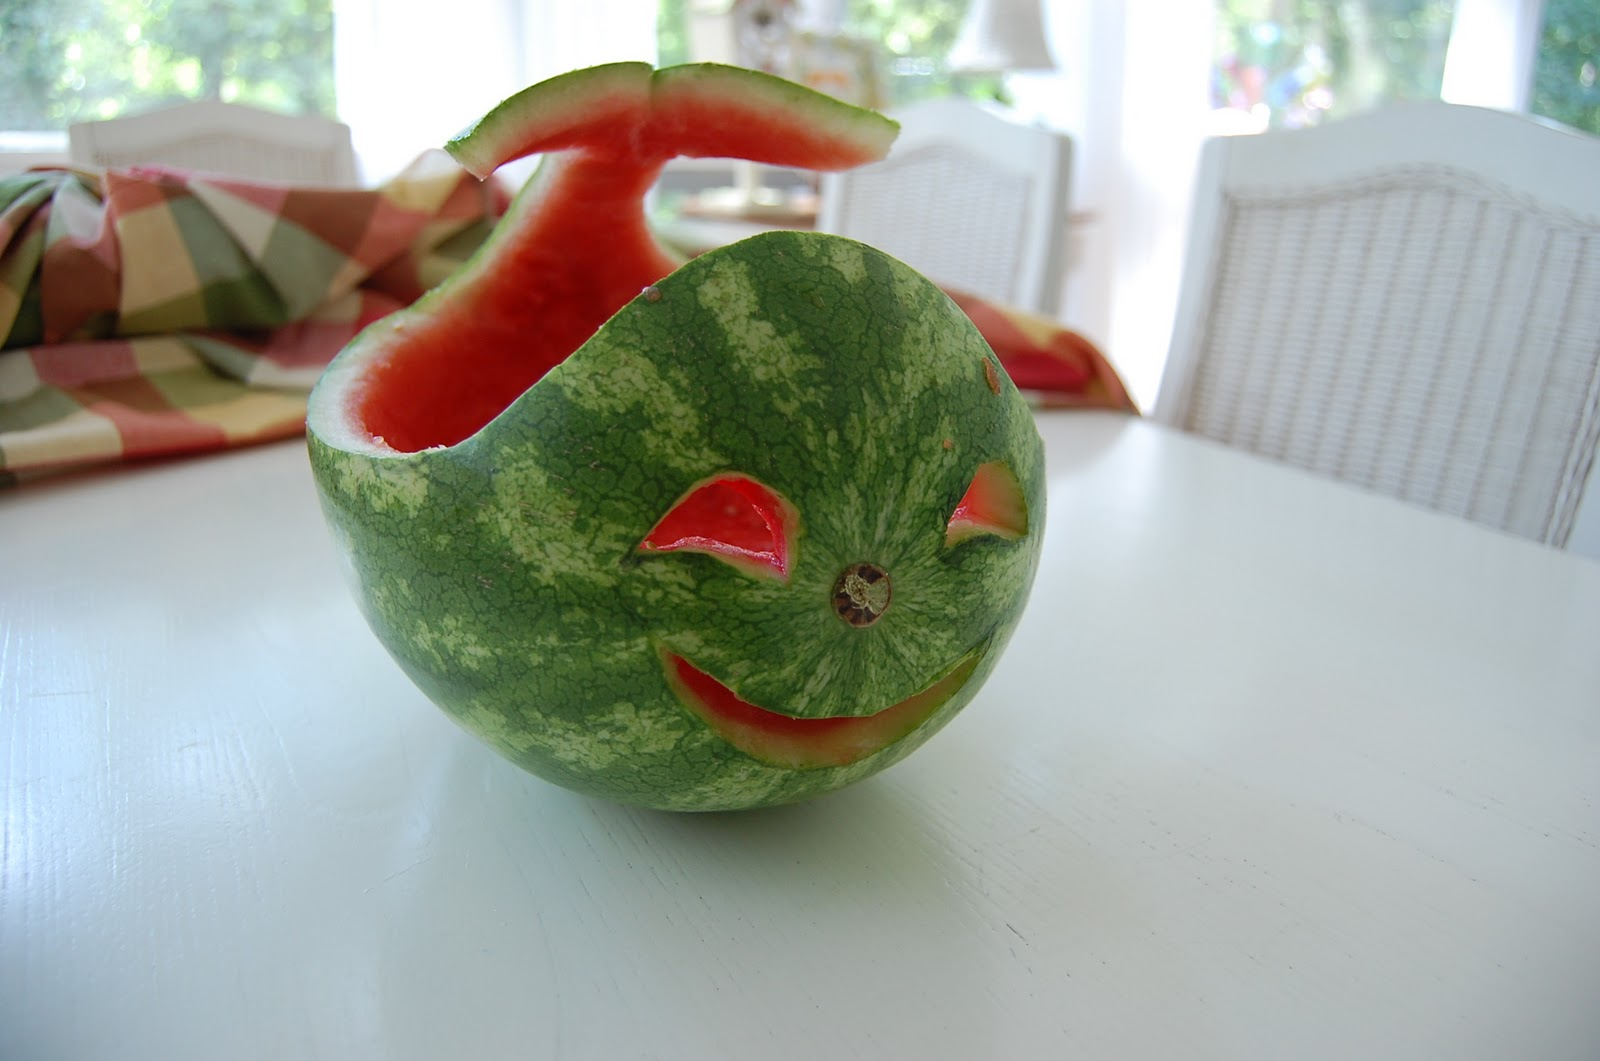 Carve a watermelon into creative shape for fun table